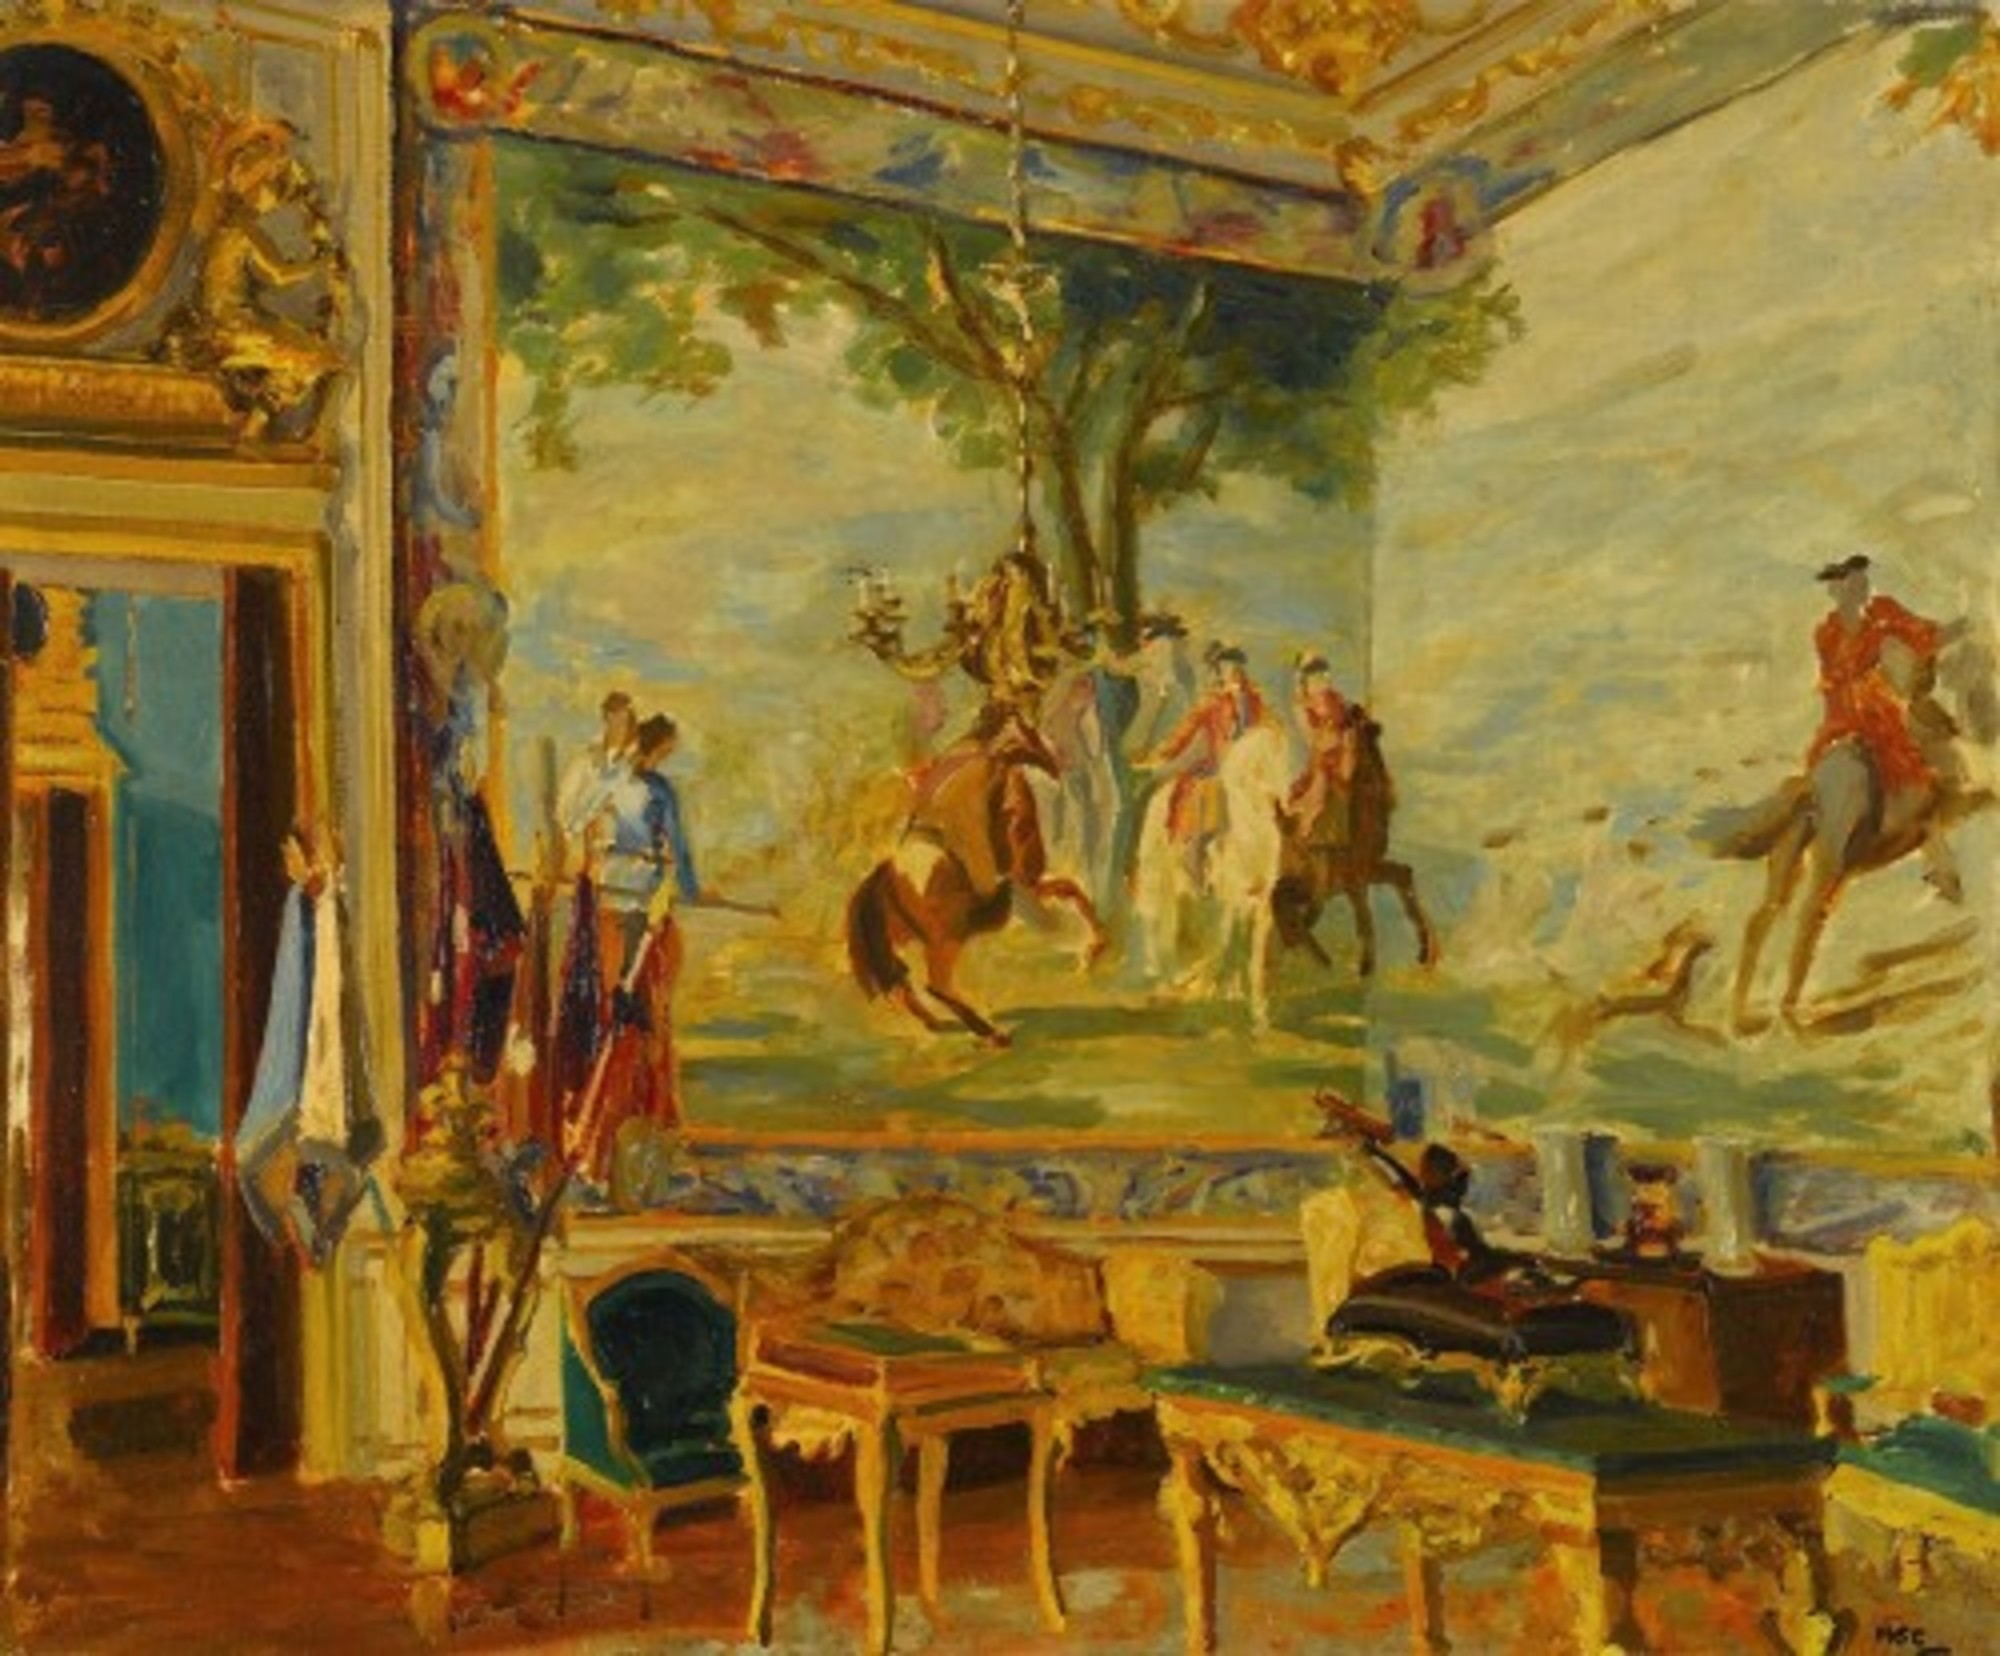 ss03-winston-churchill-painter-kempner-gallery-washington-st-louis.jpg